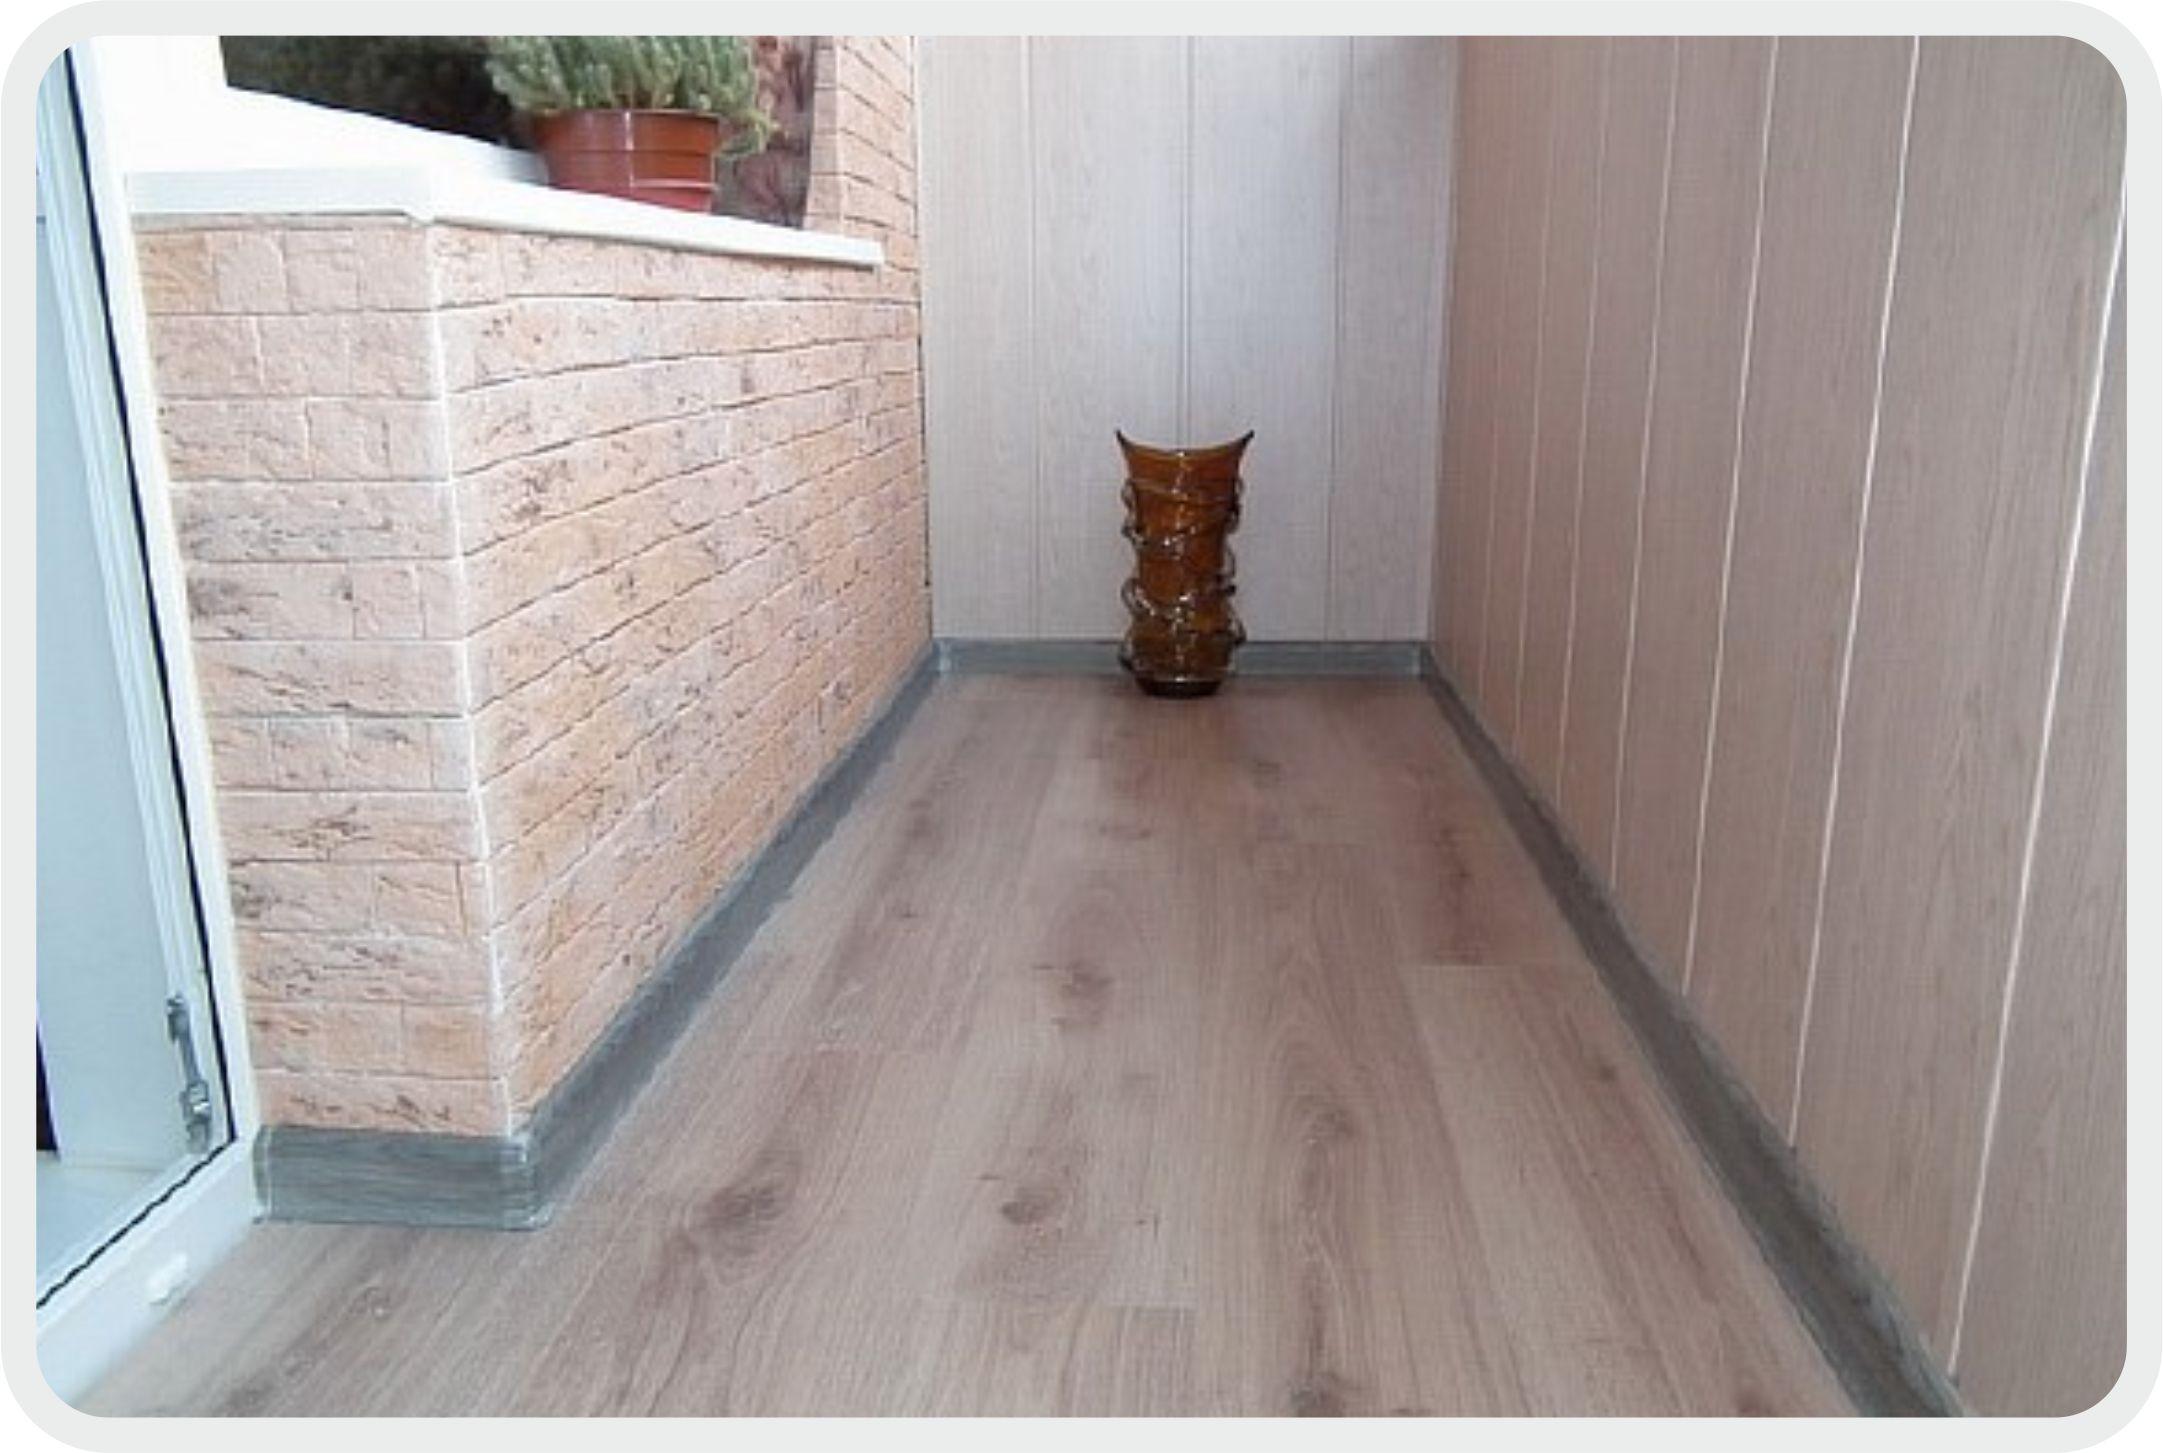 Ламинат на балкон - виды, принципы укладки